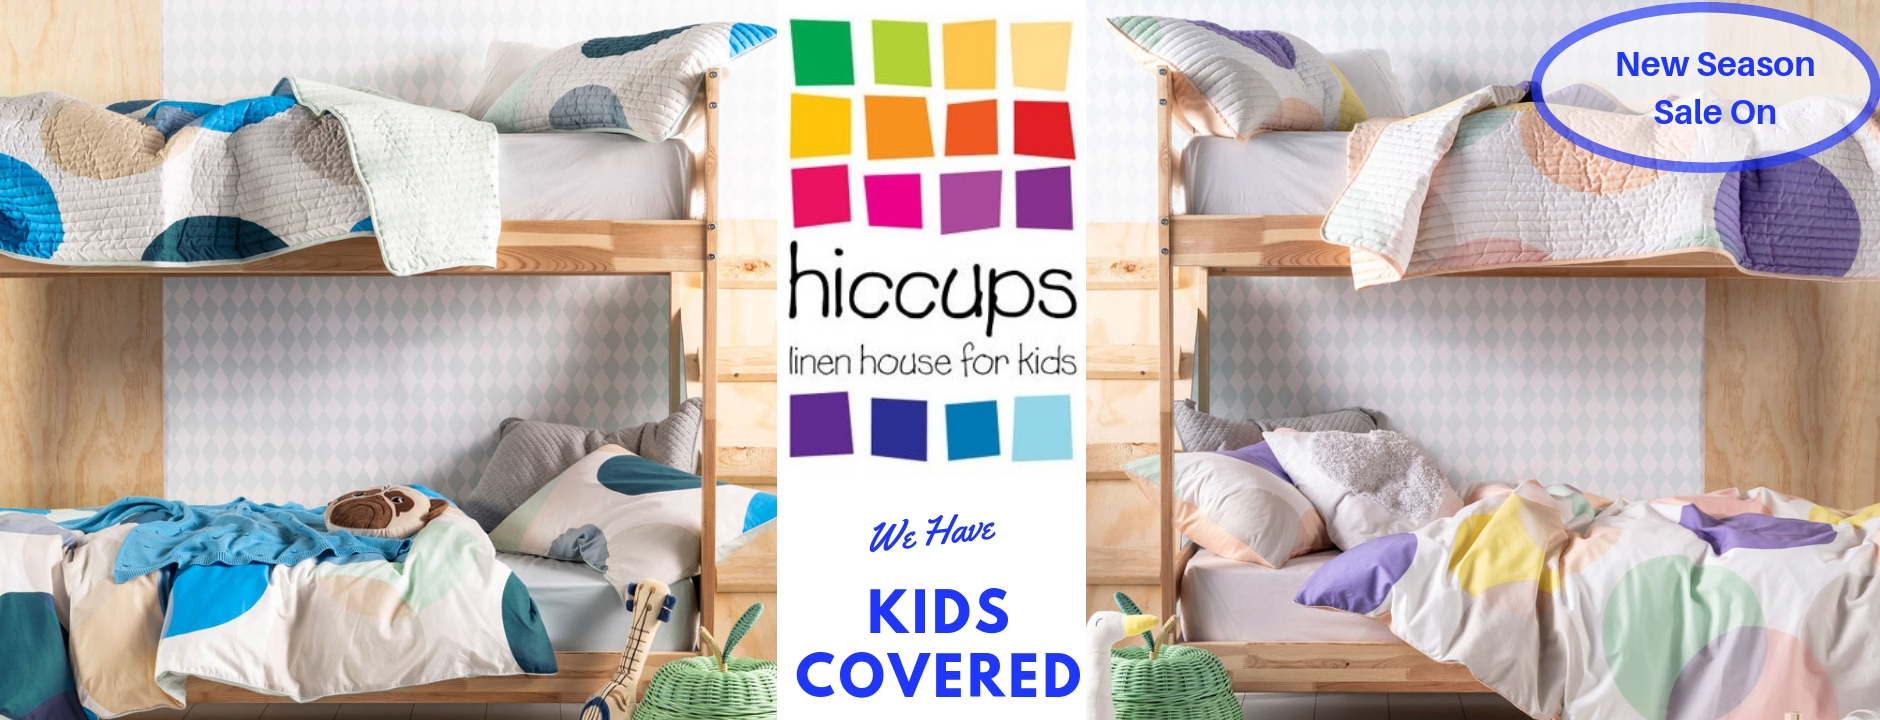 Hiccups Range